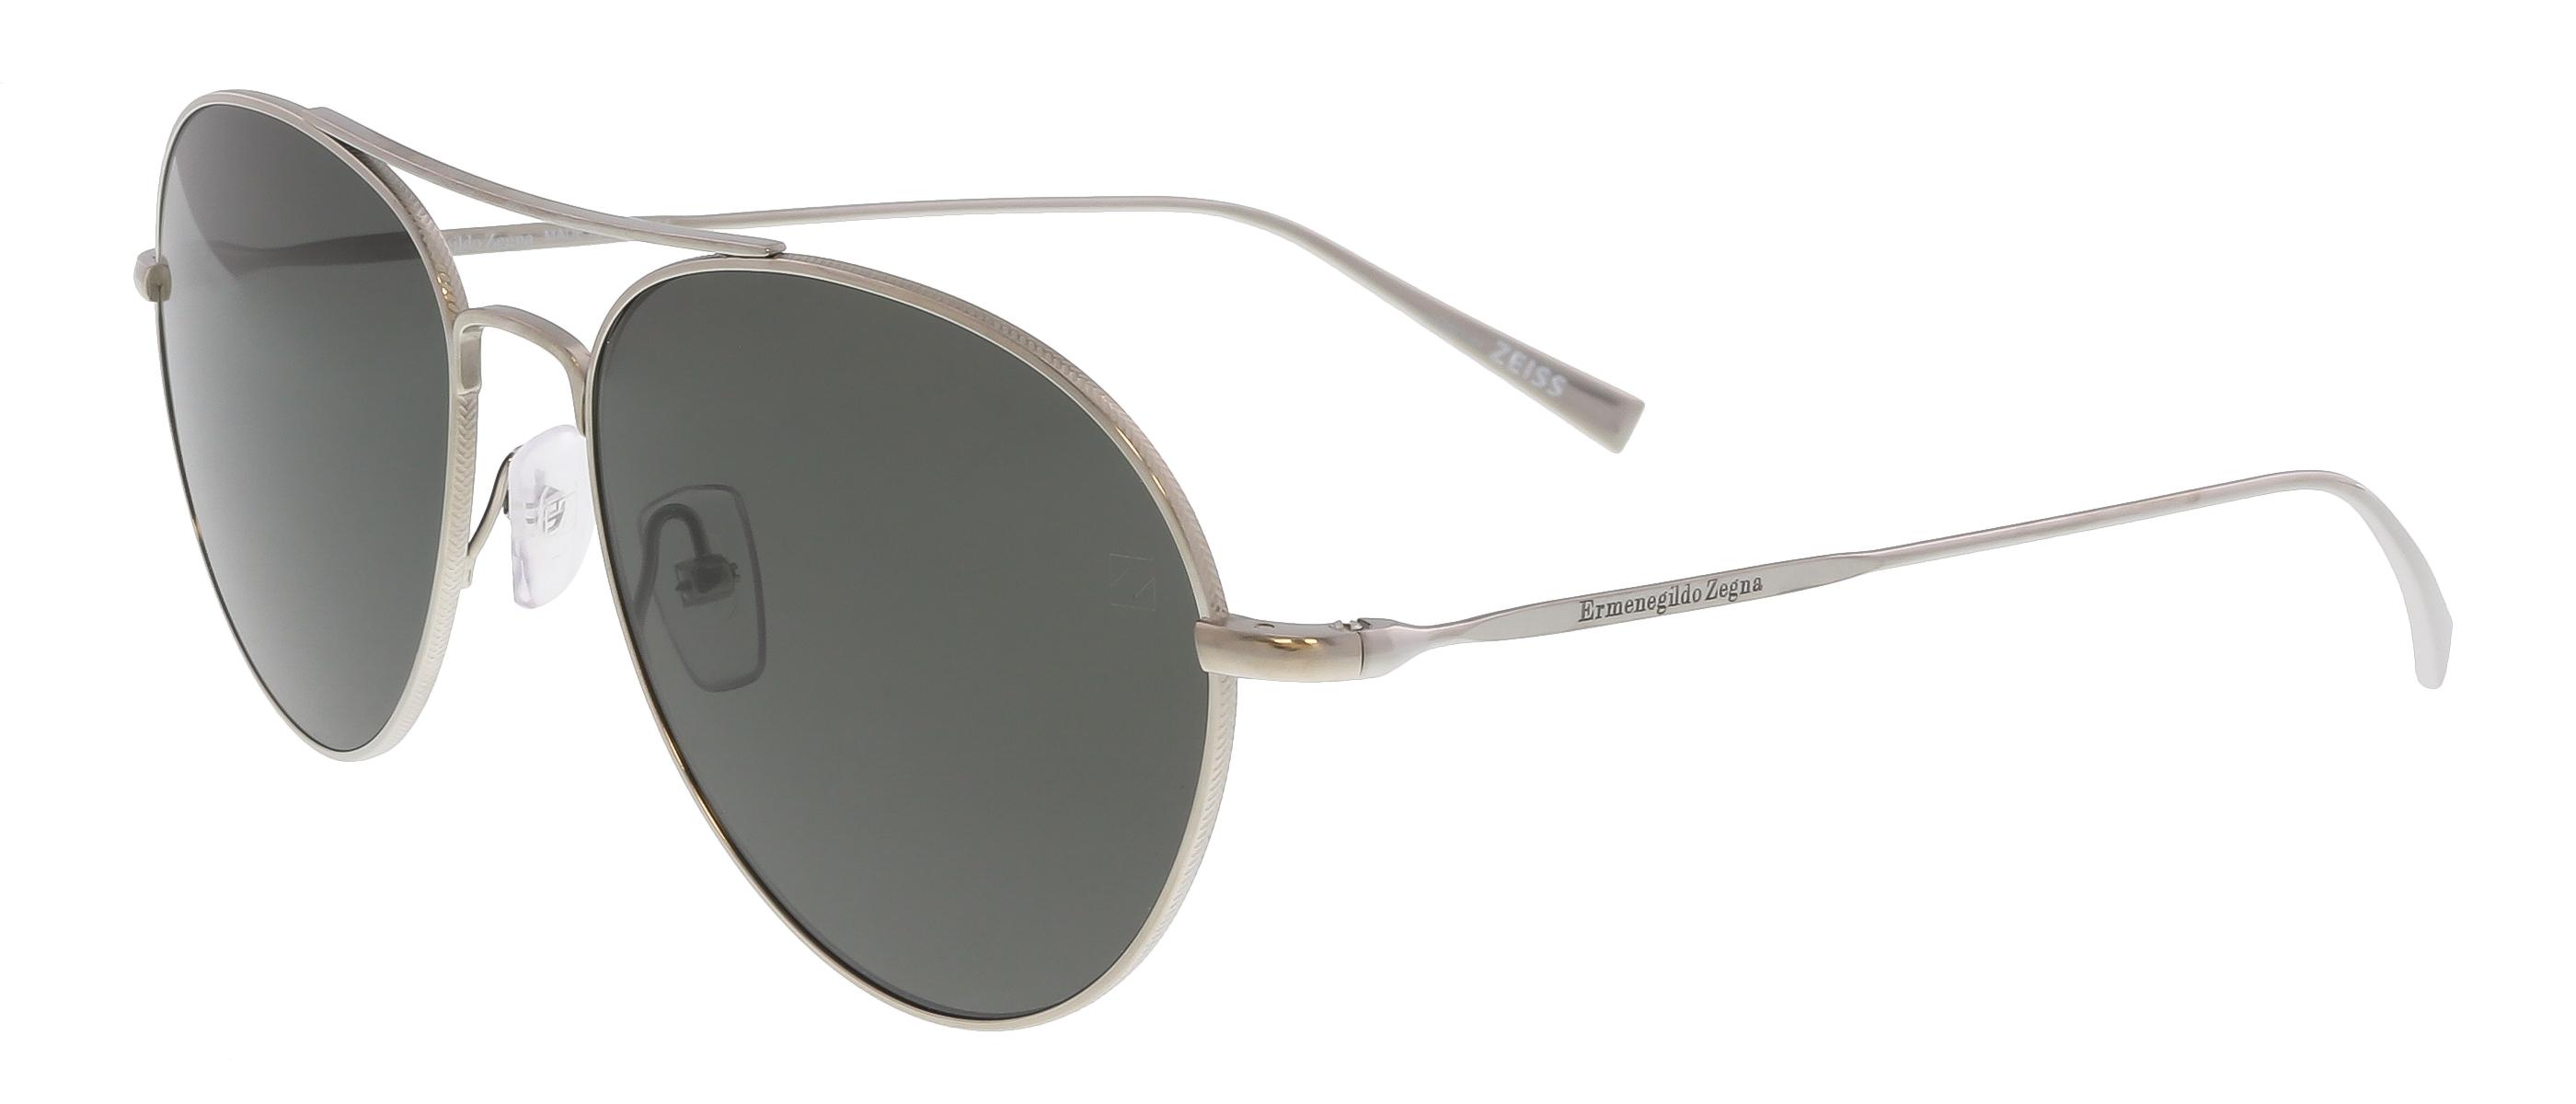 EZ0033 14D Matte Silver Aviator Feline Sunglasses